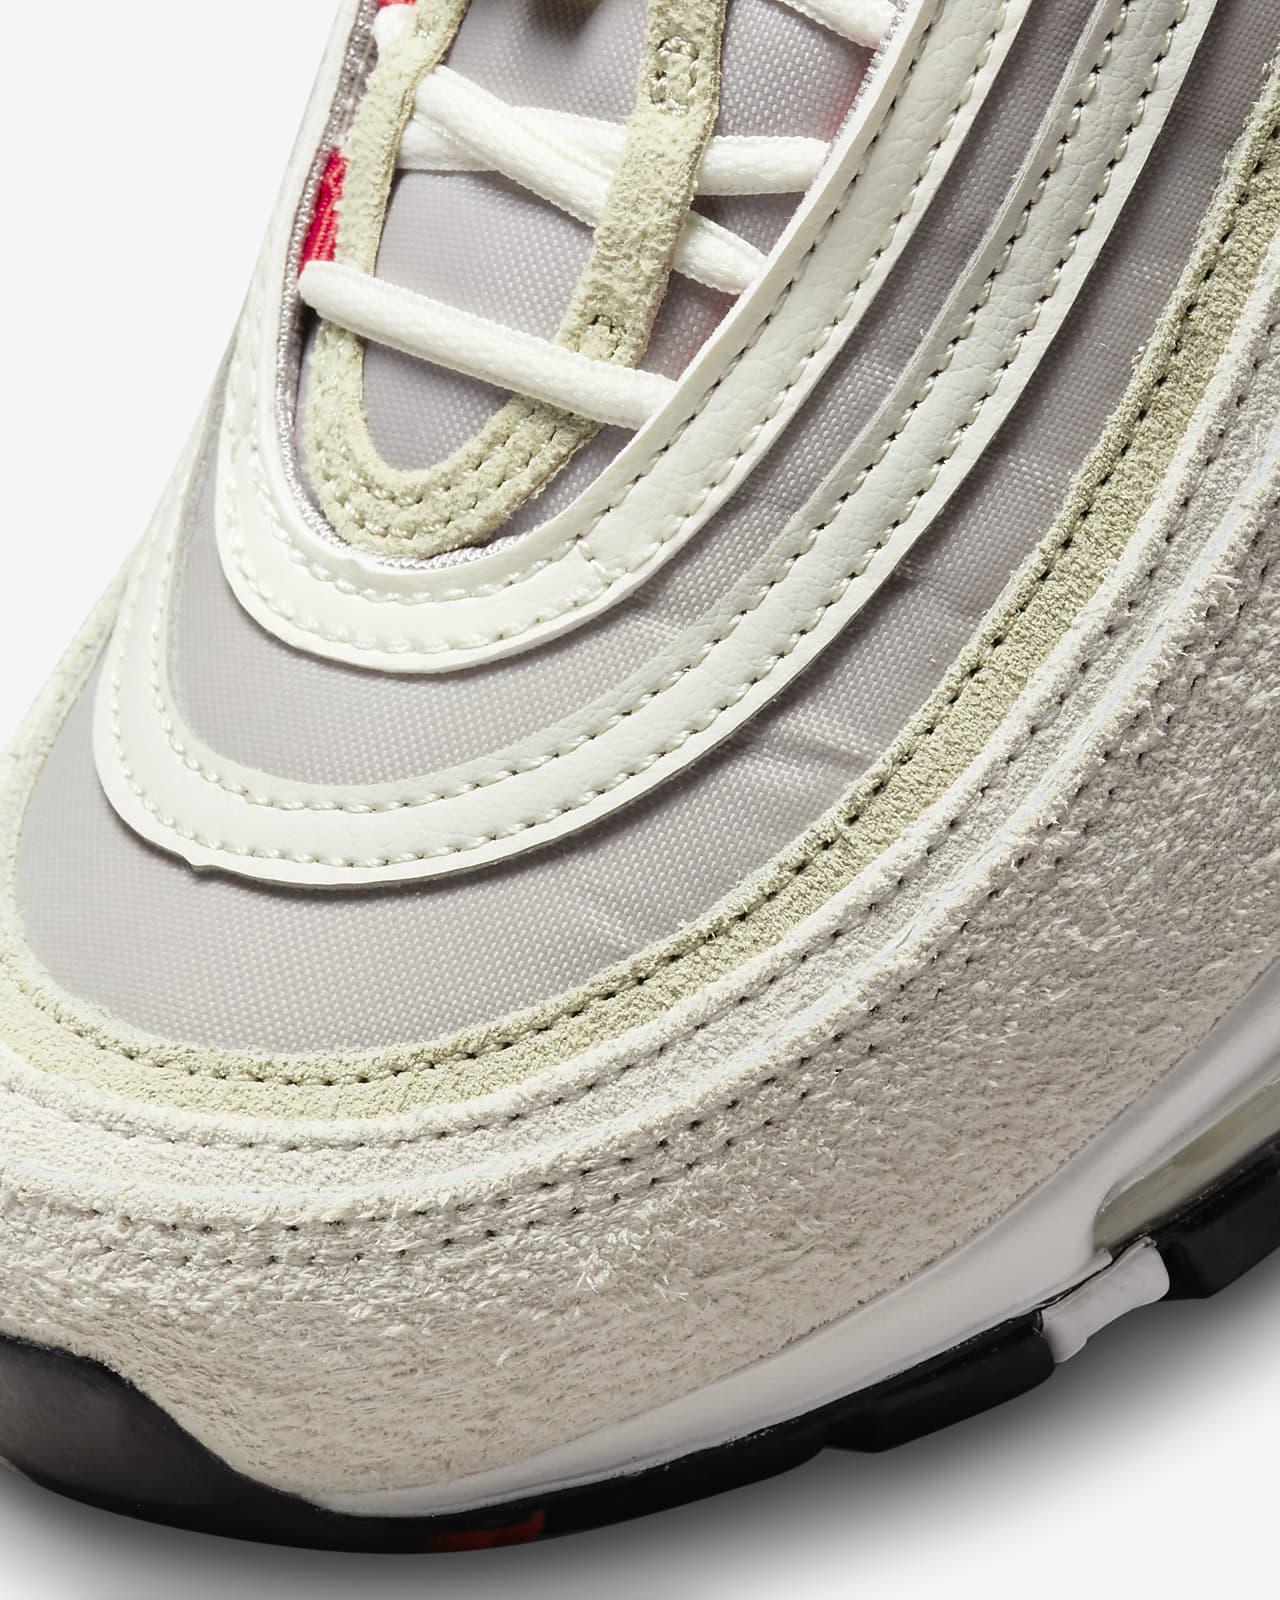 Nike Air Max 97 SE Men's Shoes